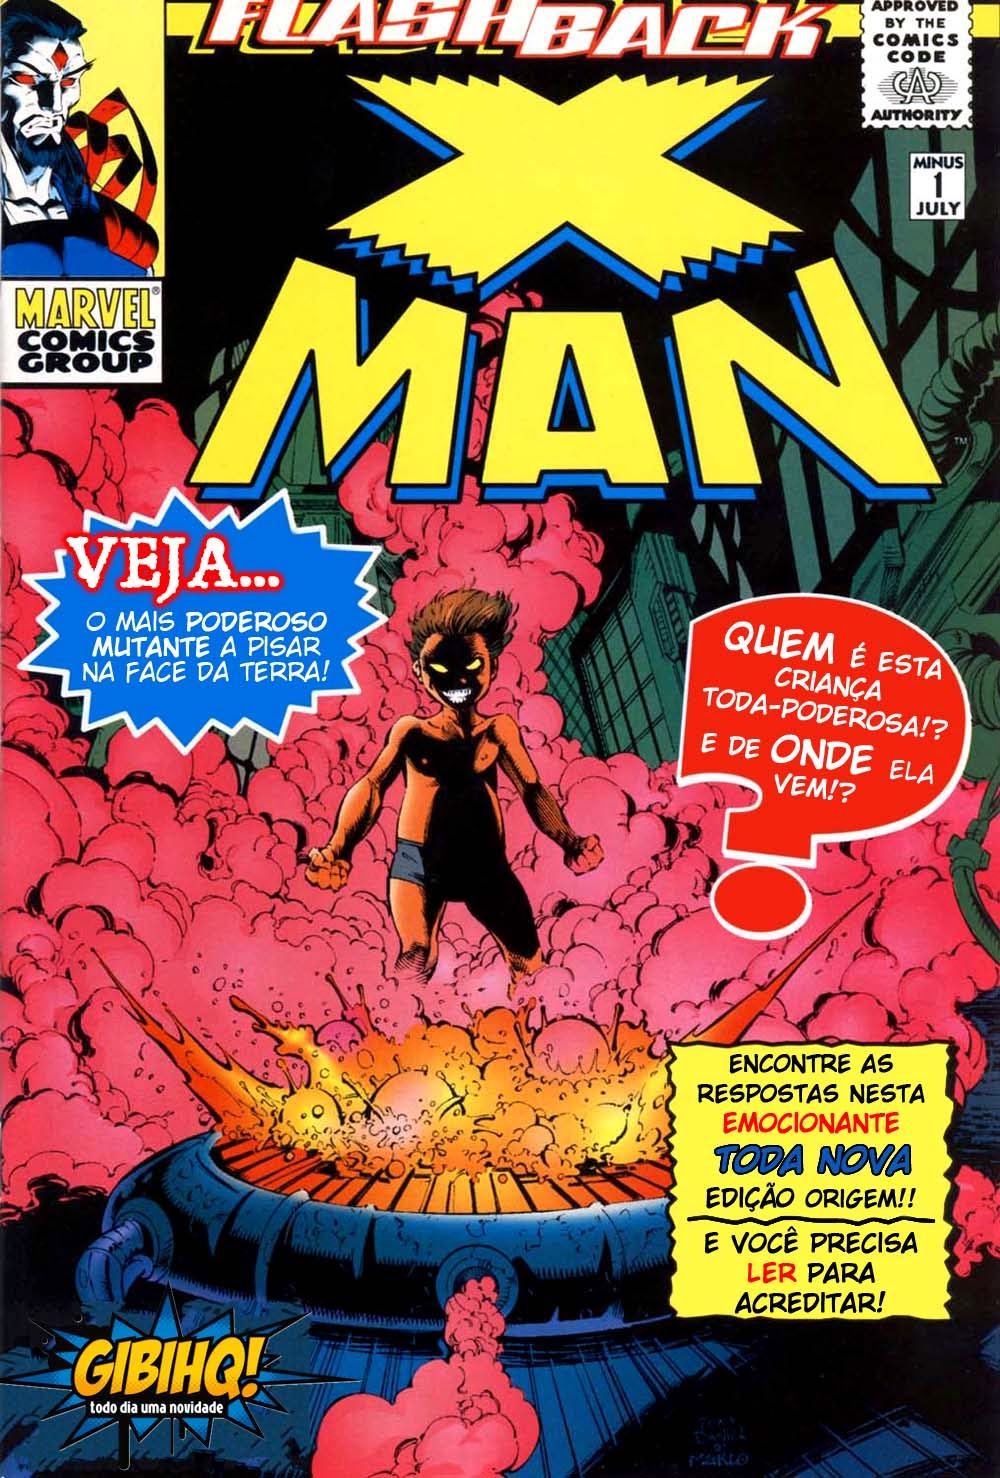 X-Men - A Era do Apocalipse #4